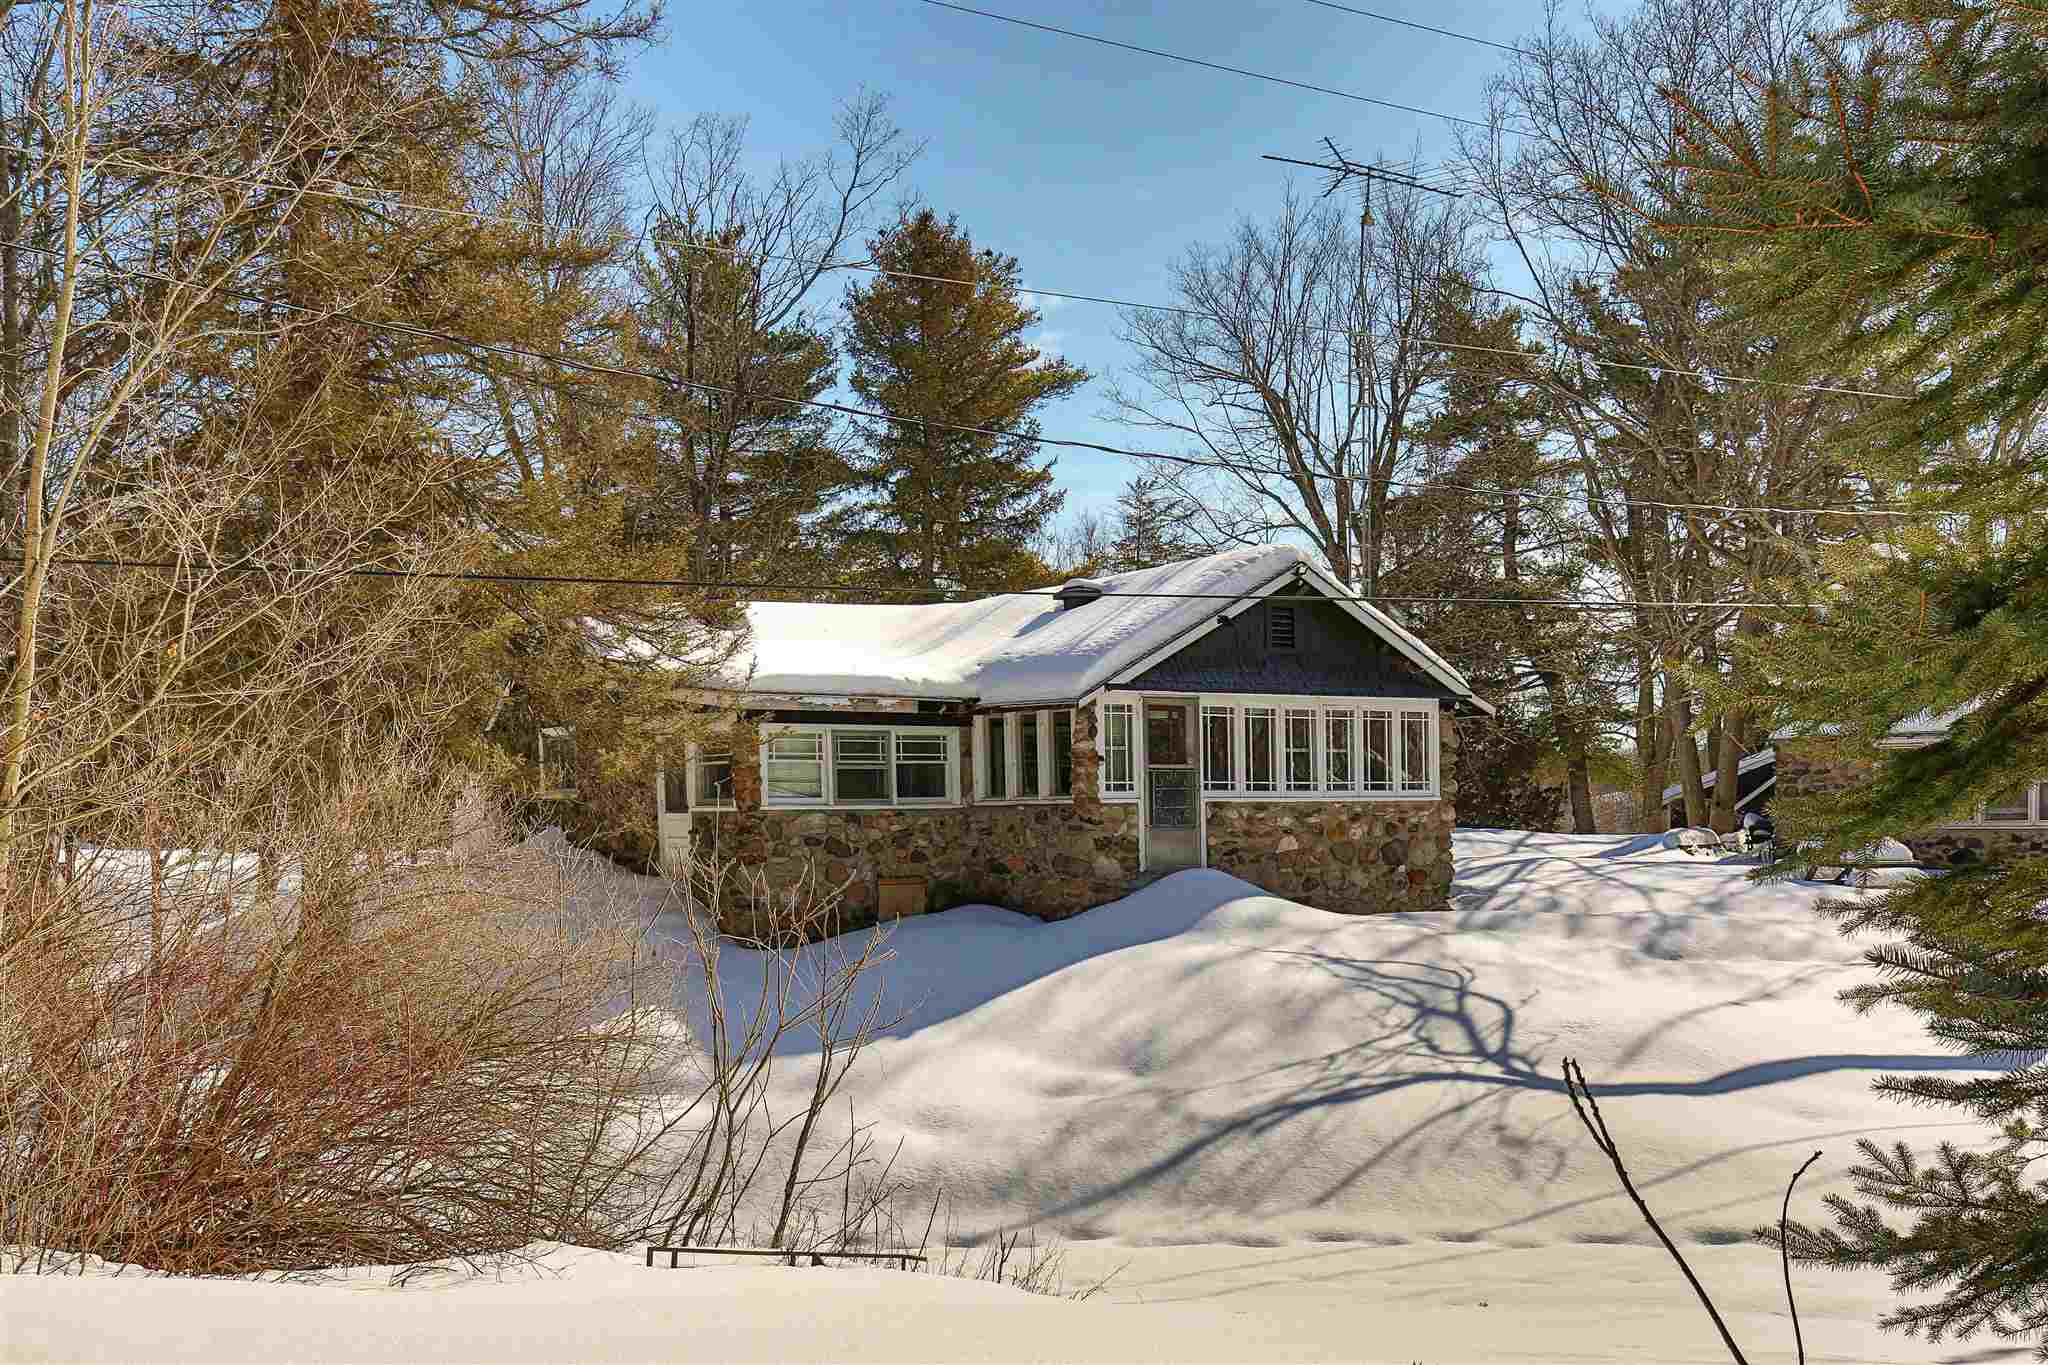 2585 Bolingbroke Road, Tay Valley Township, Ontario (ID K21001121)